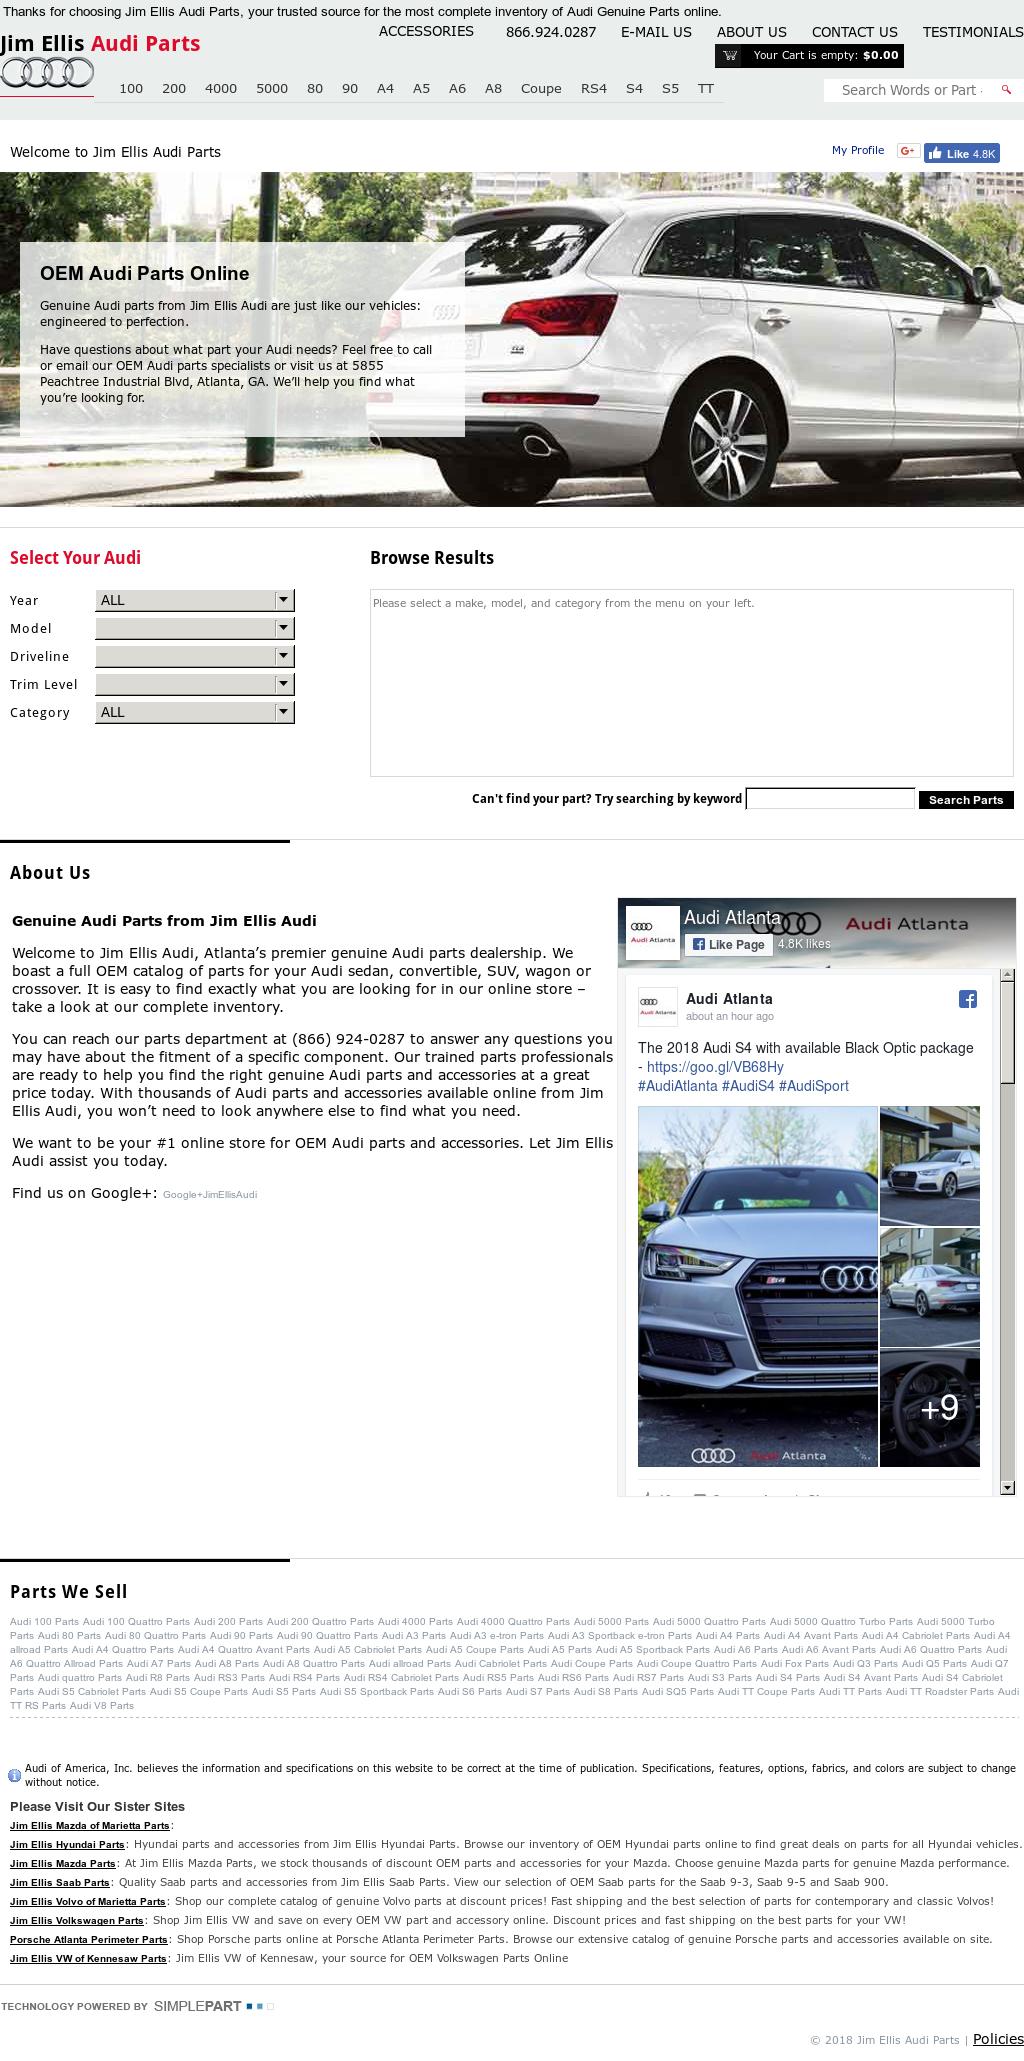 Jim Ellis Audi Parts Competitors Revenue And Employees Owler - Jim ellis audi atlanta